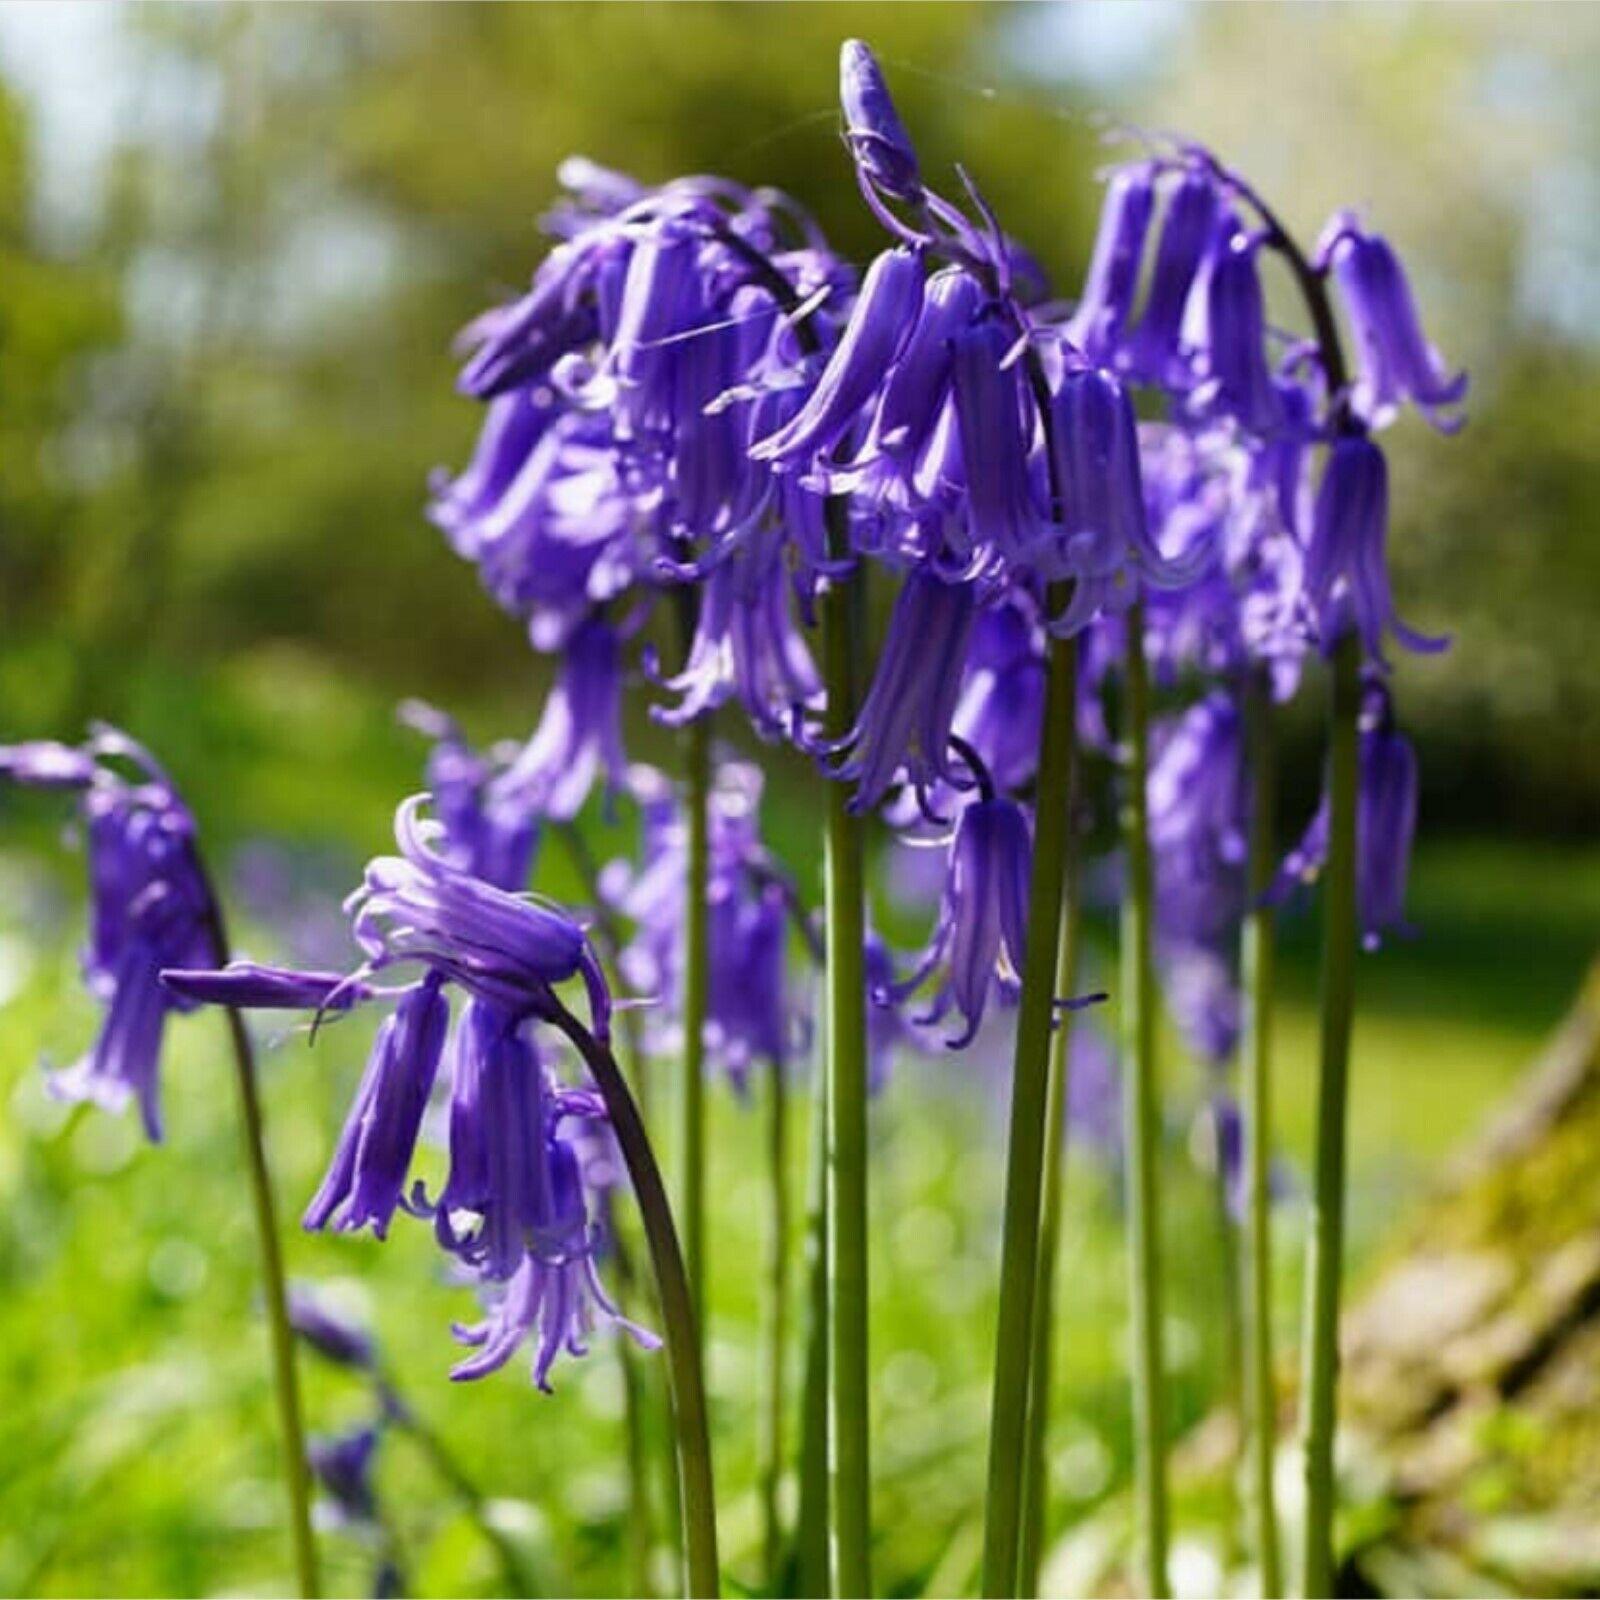 100 ENGLISH BLUEBELL BULBS Hyacinthoides Non Scripta IN THE GREEN